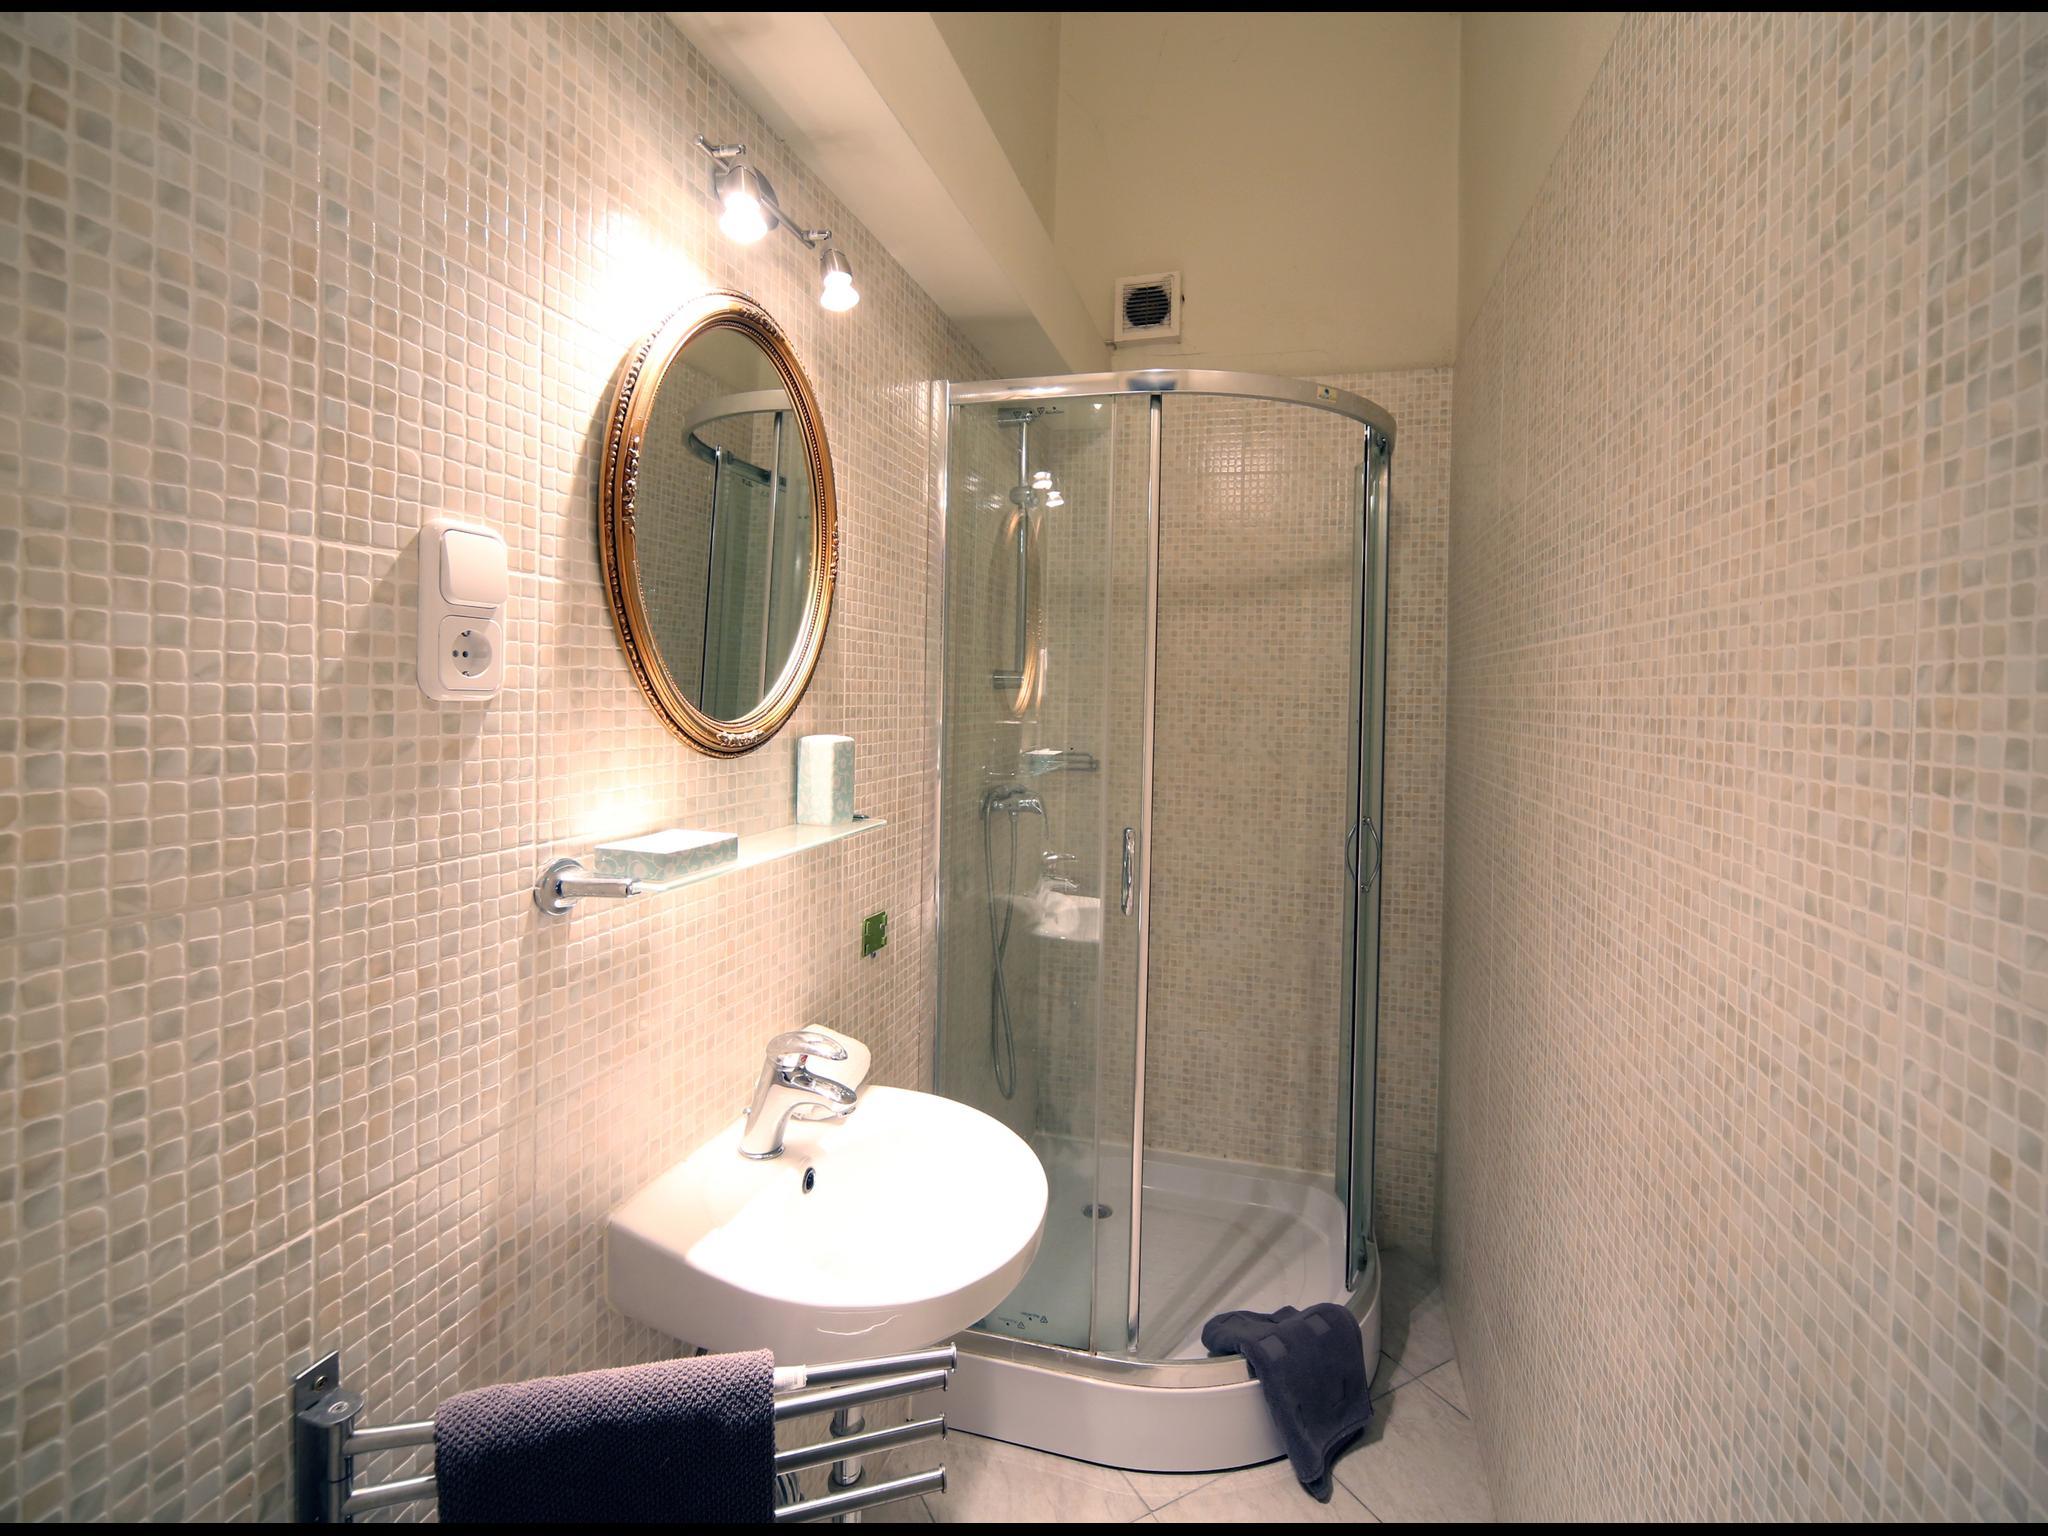 Bastya - 2 bedroom modern flat in Budapest